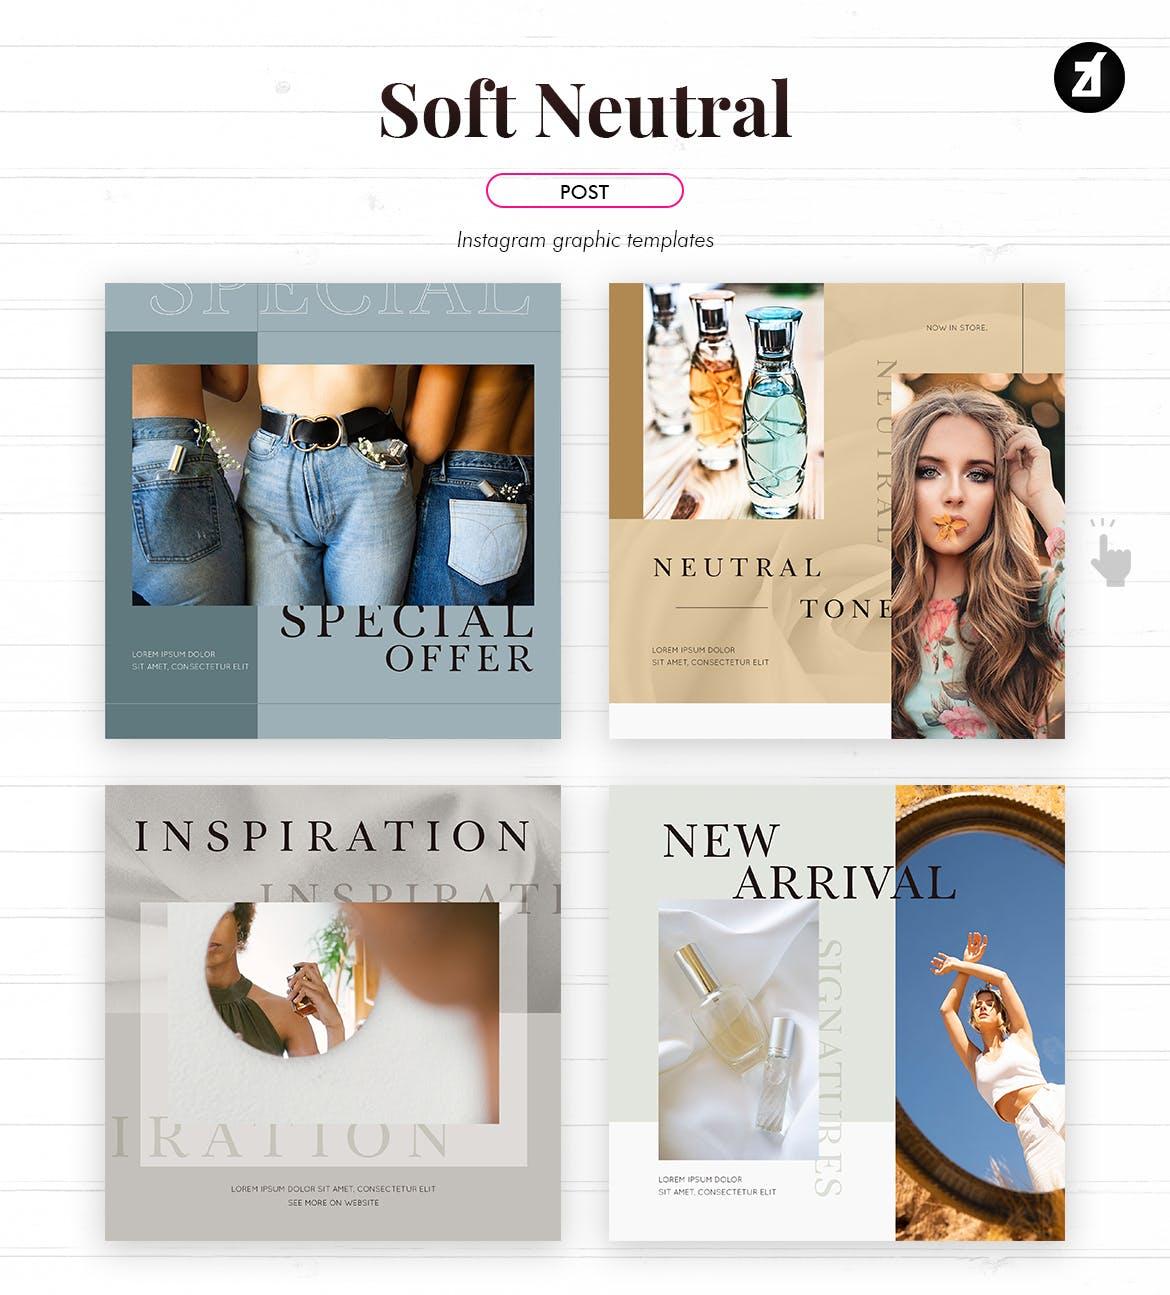 时尚化妆护肤品品牌推广新媒体电商海报模板 Soft Neutral Social Media Graphic Templates插图2